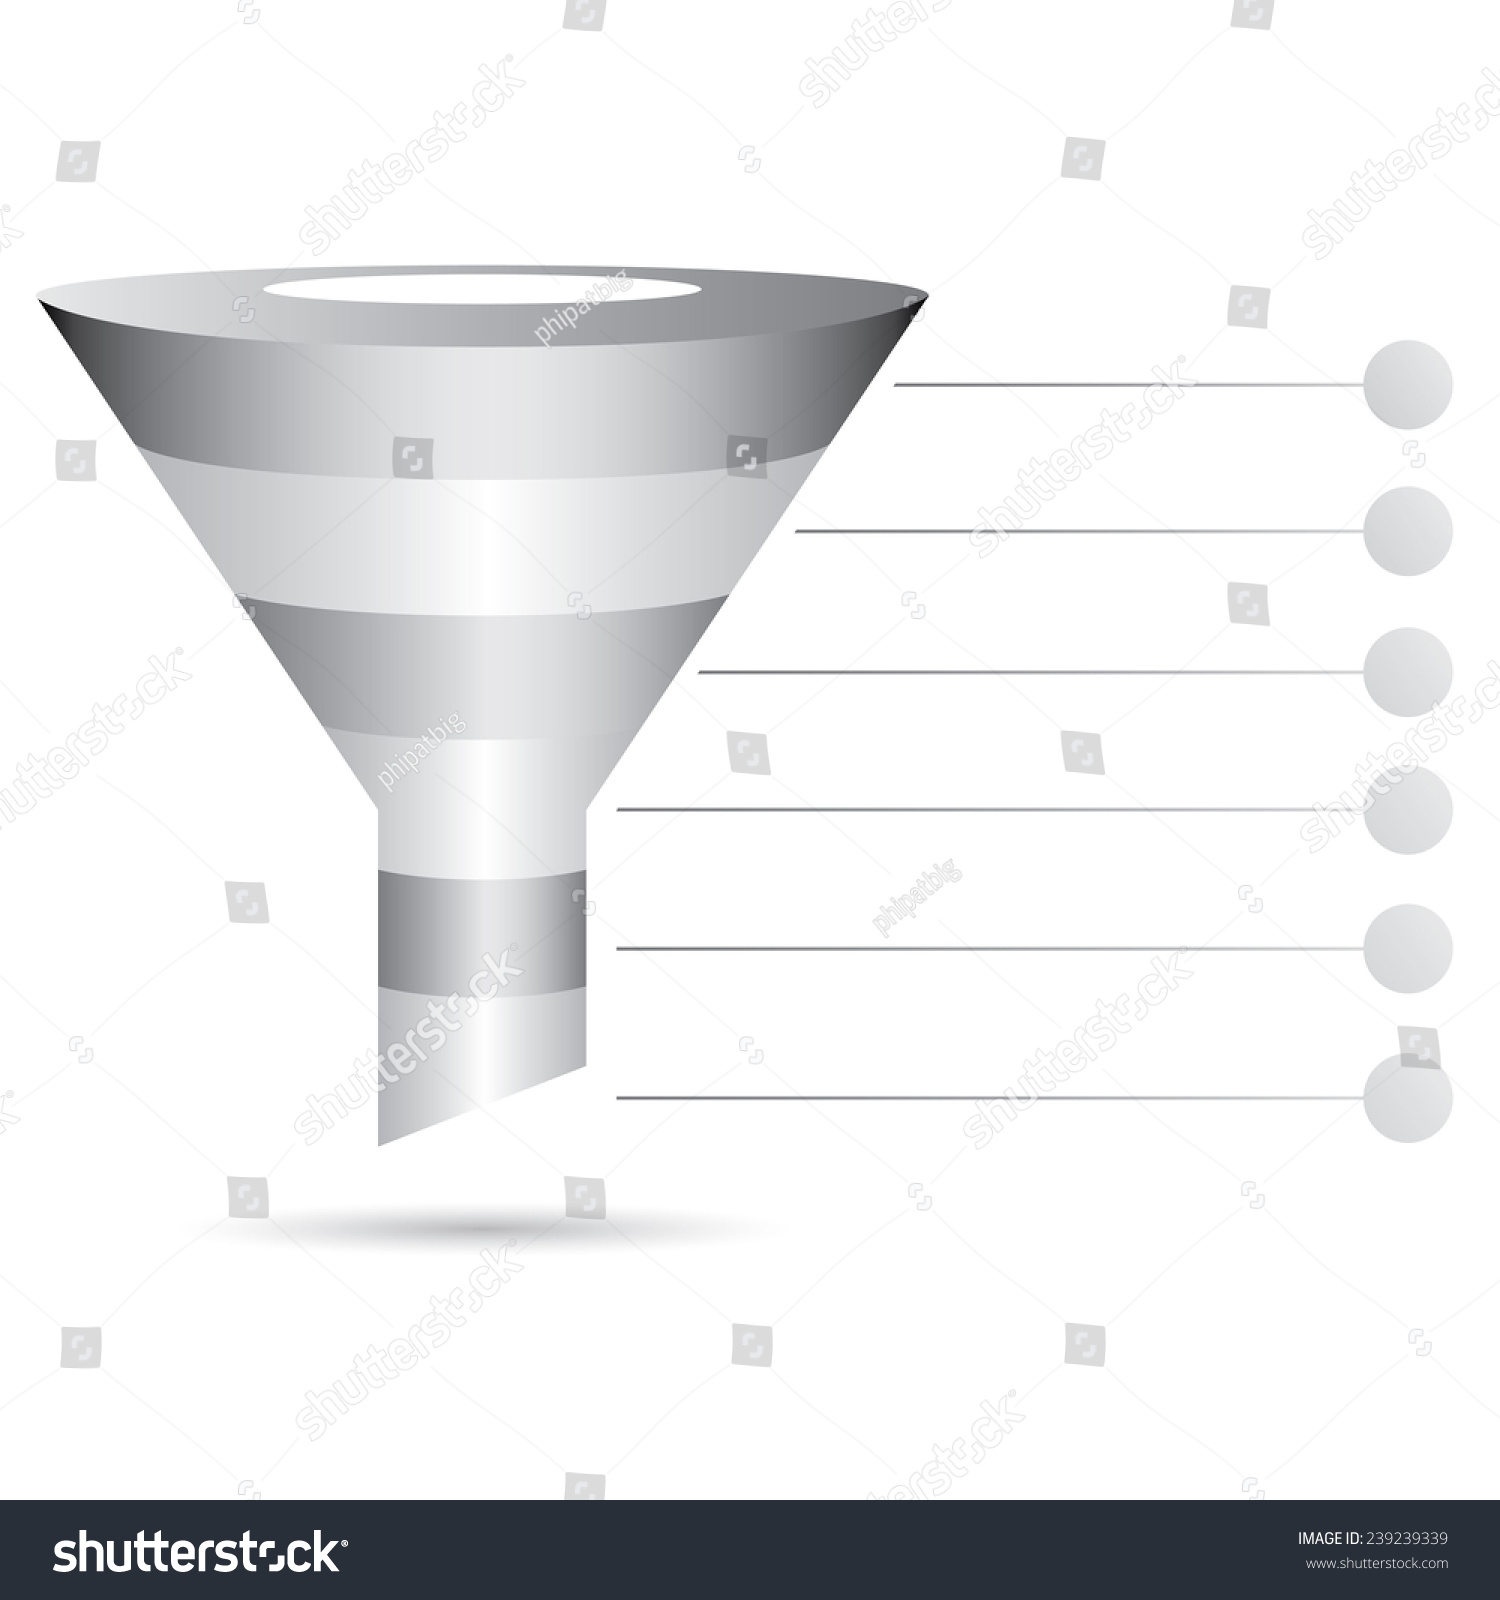 Metal Filter Diagram  Funnel Diagram  Marketing And Sale